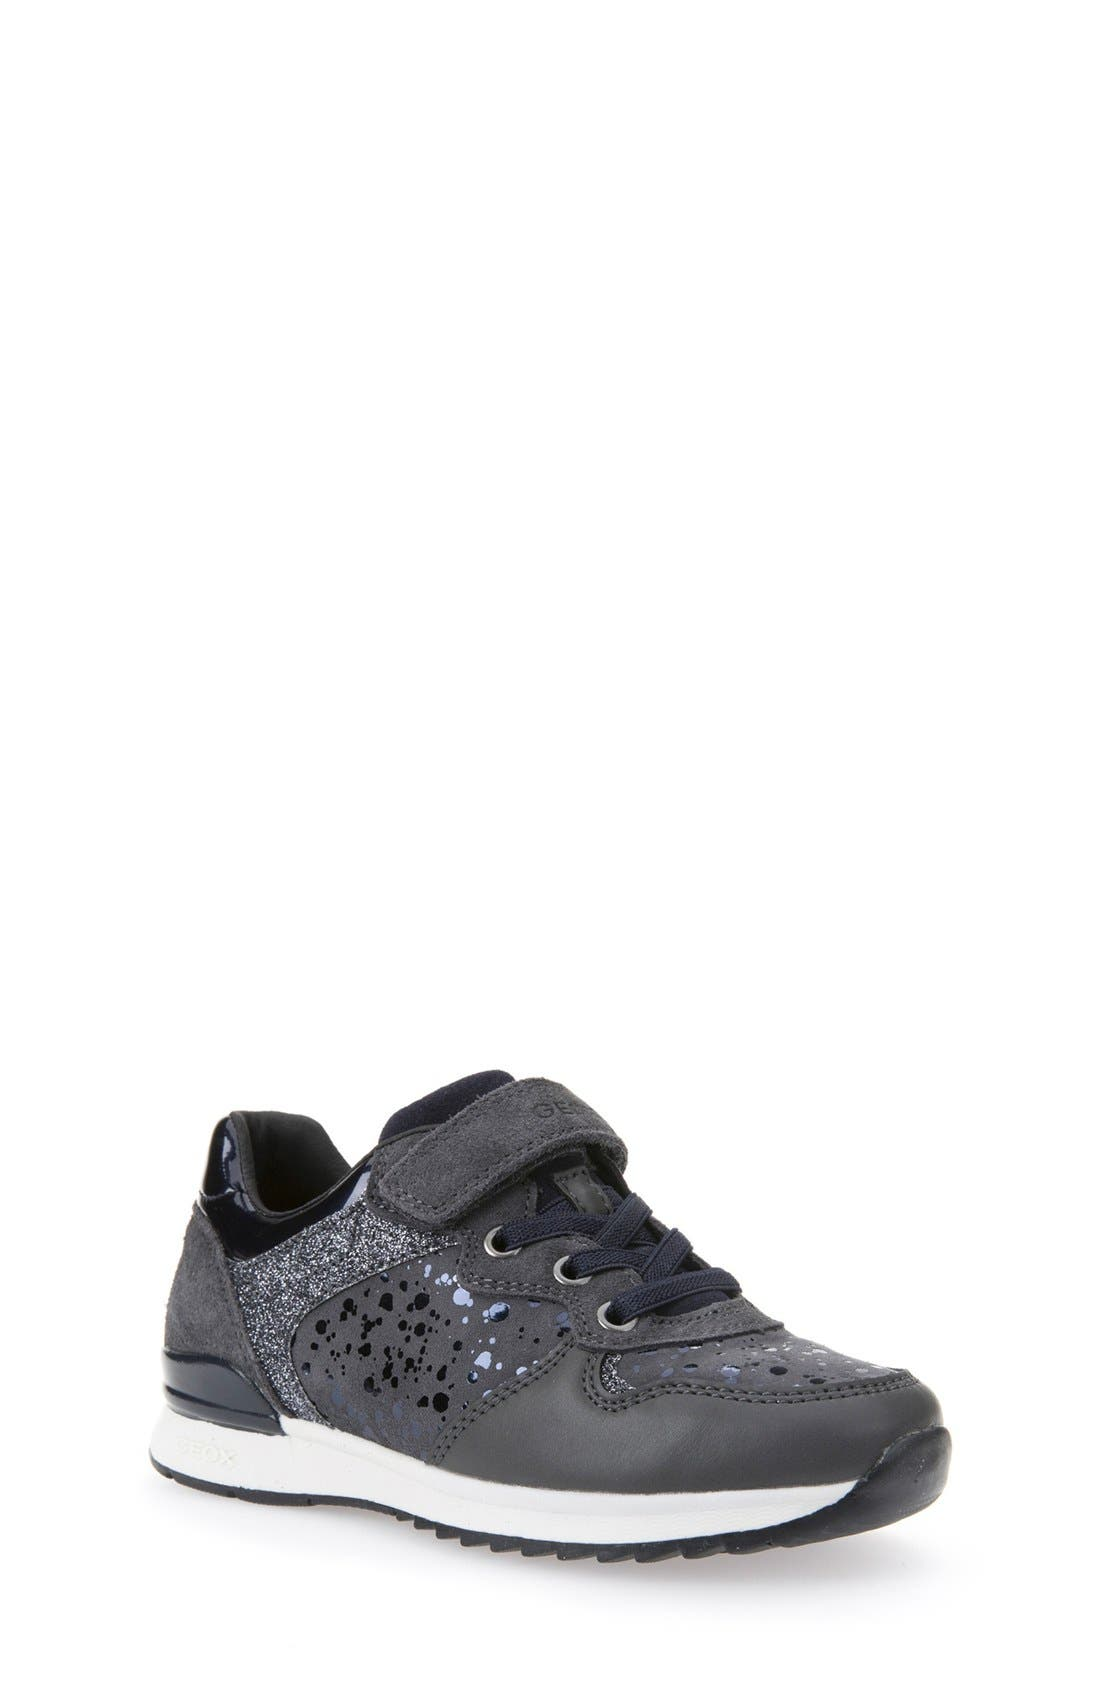 Maisie Sneaker,                             Main thumbnail 1, color,                             021